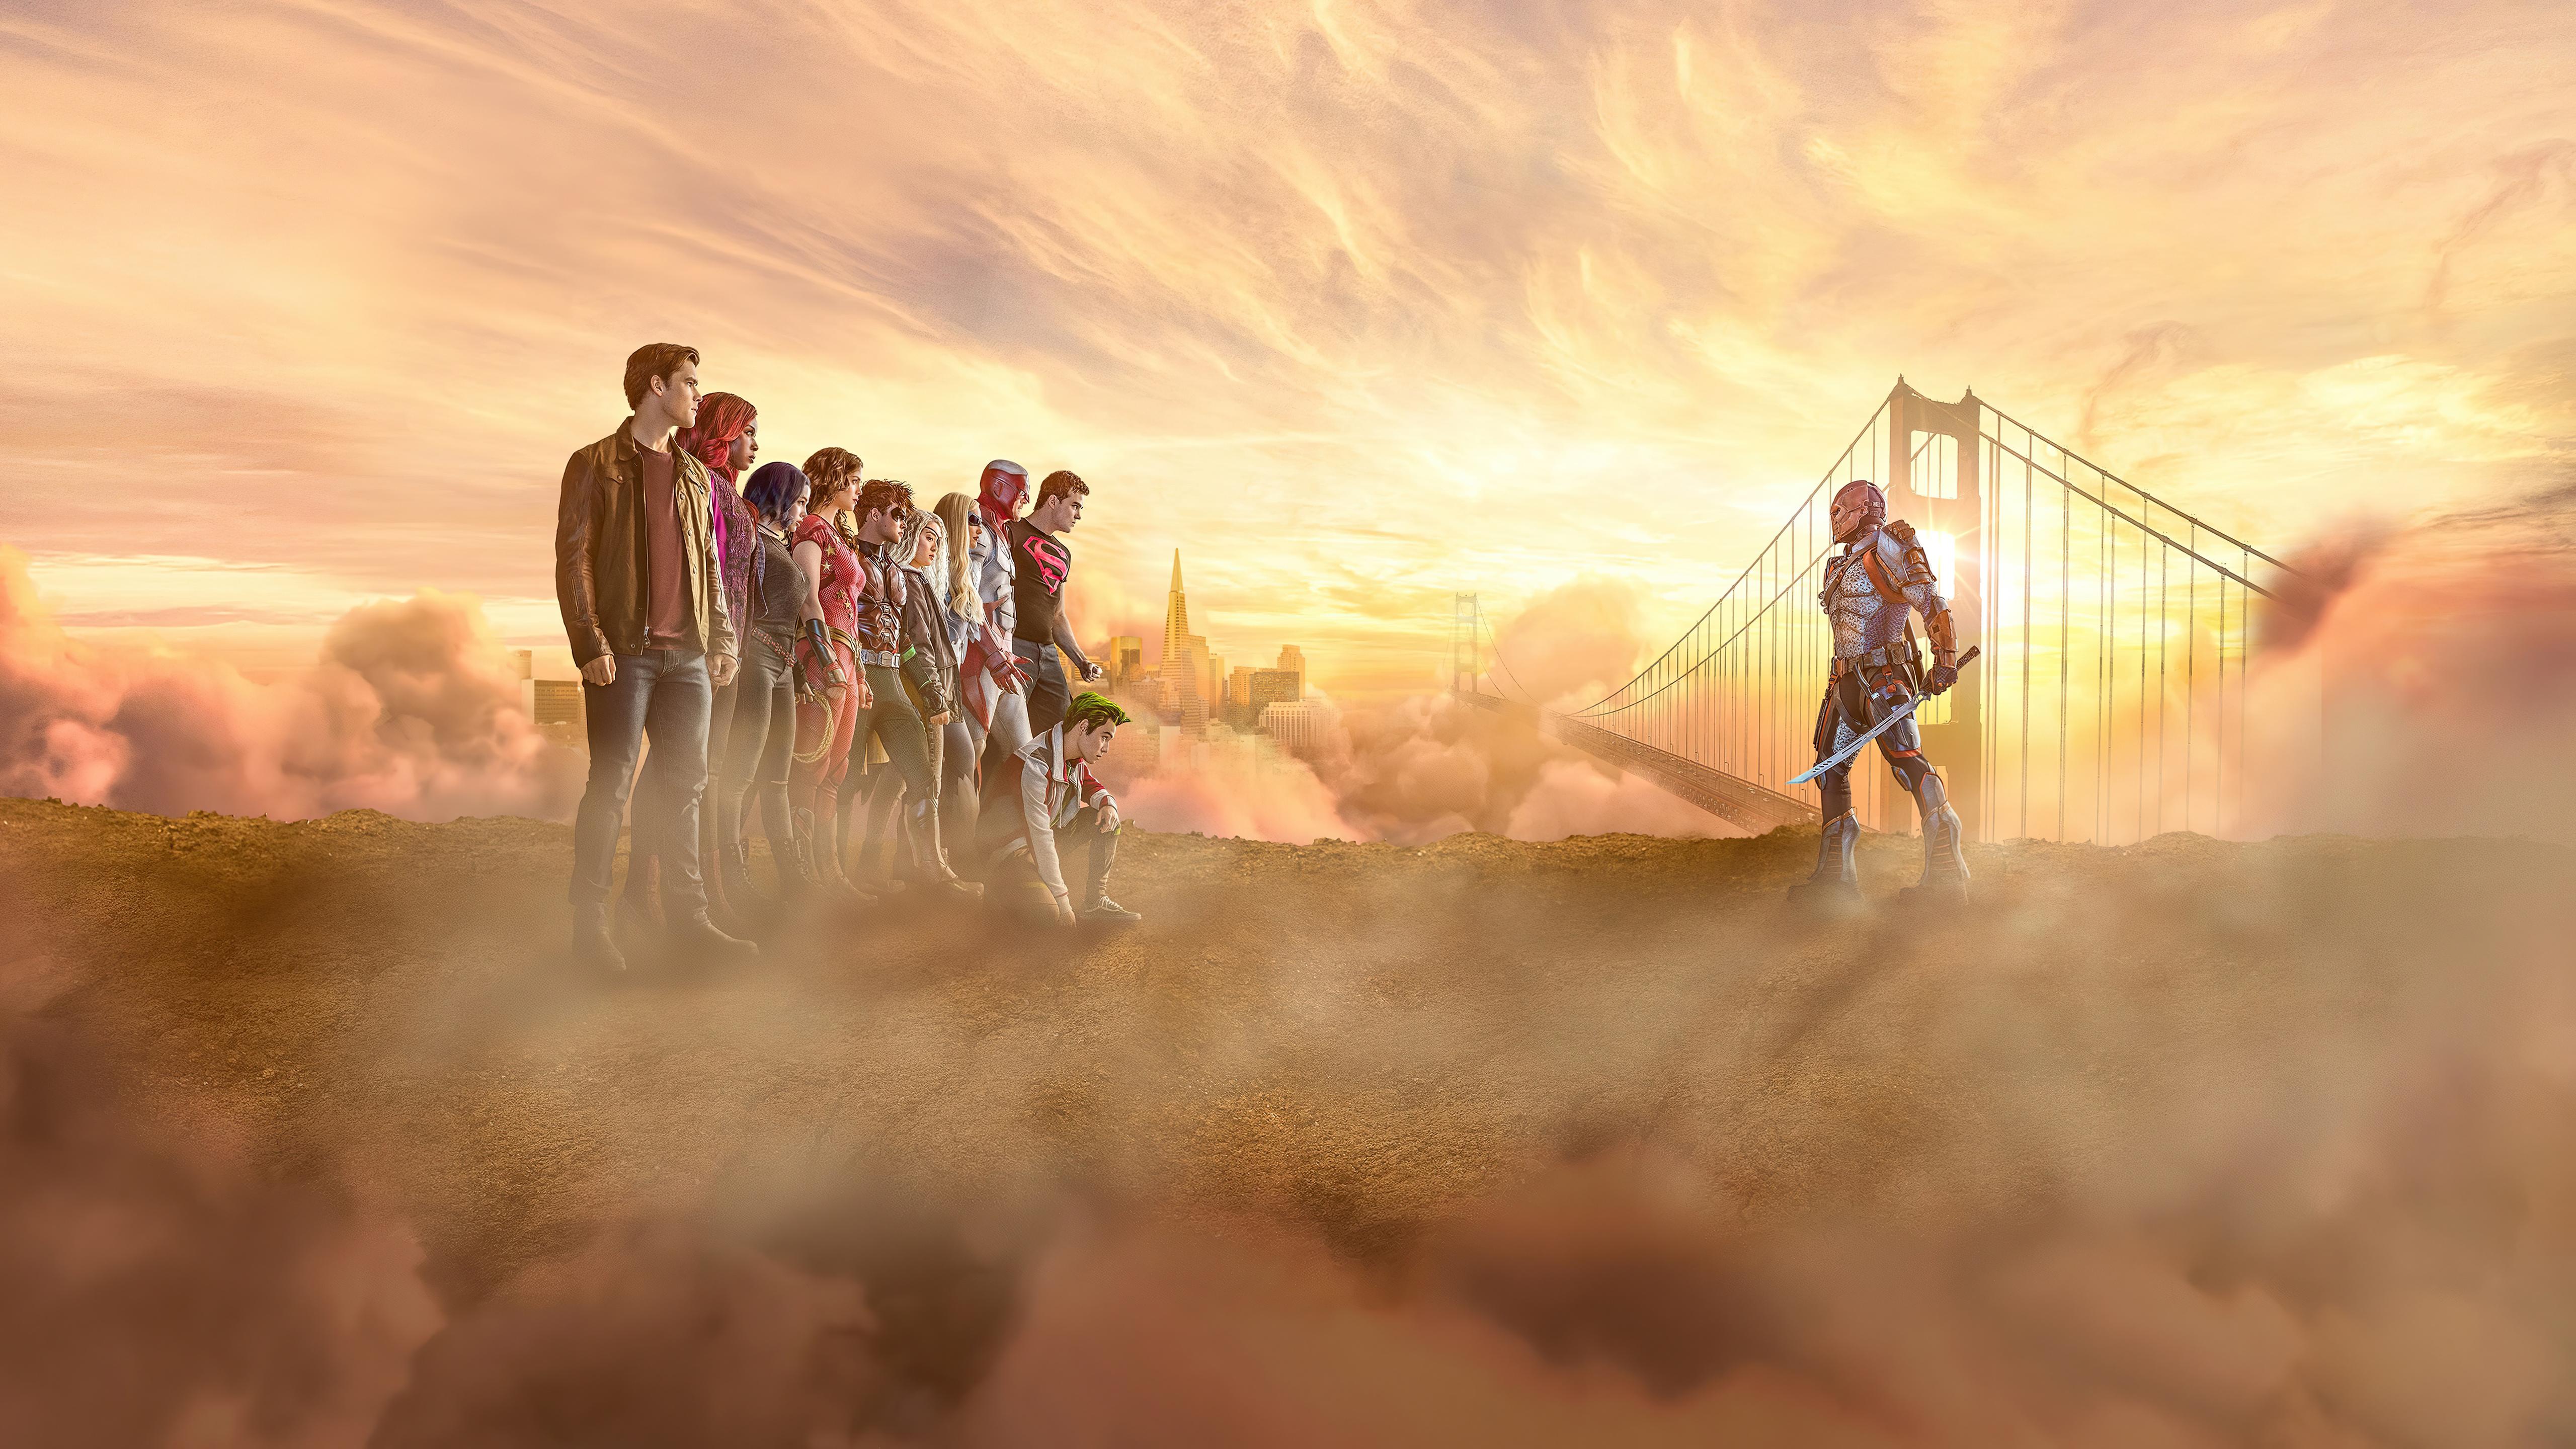 titans season 3 cast poster 4k 1629771506 - Titans Season 3 Cast Poster 4k - Titans Season 3 Cast Poster wallpapers, Titans Season 3 Cast Poster 4k wallpapers